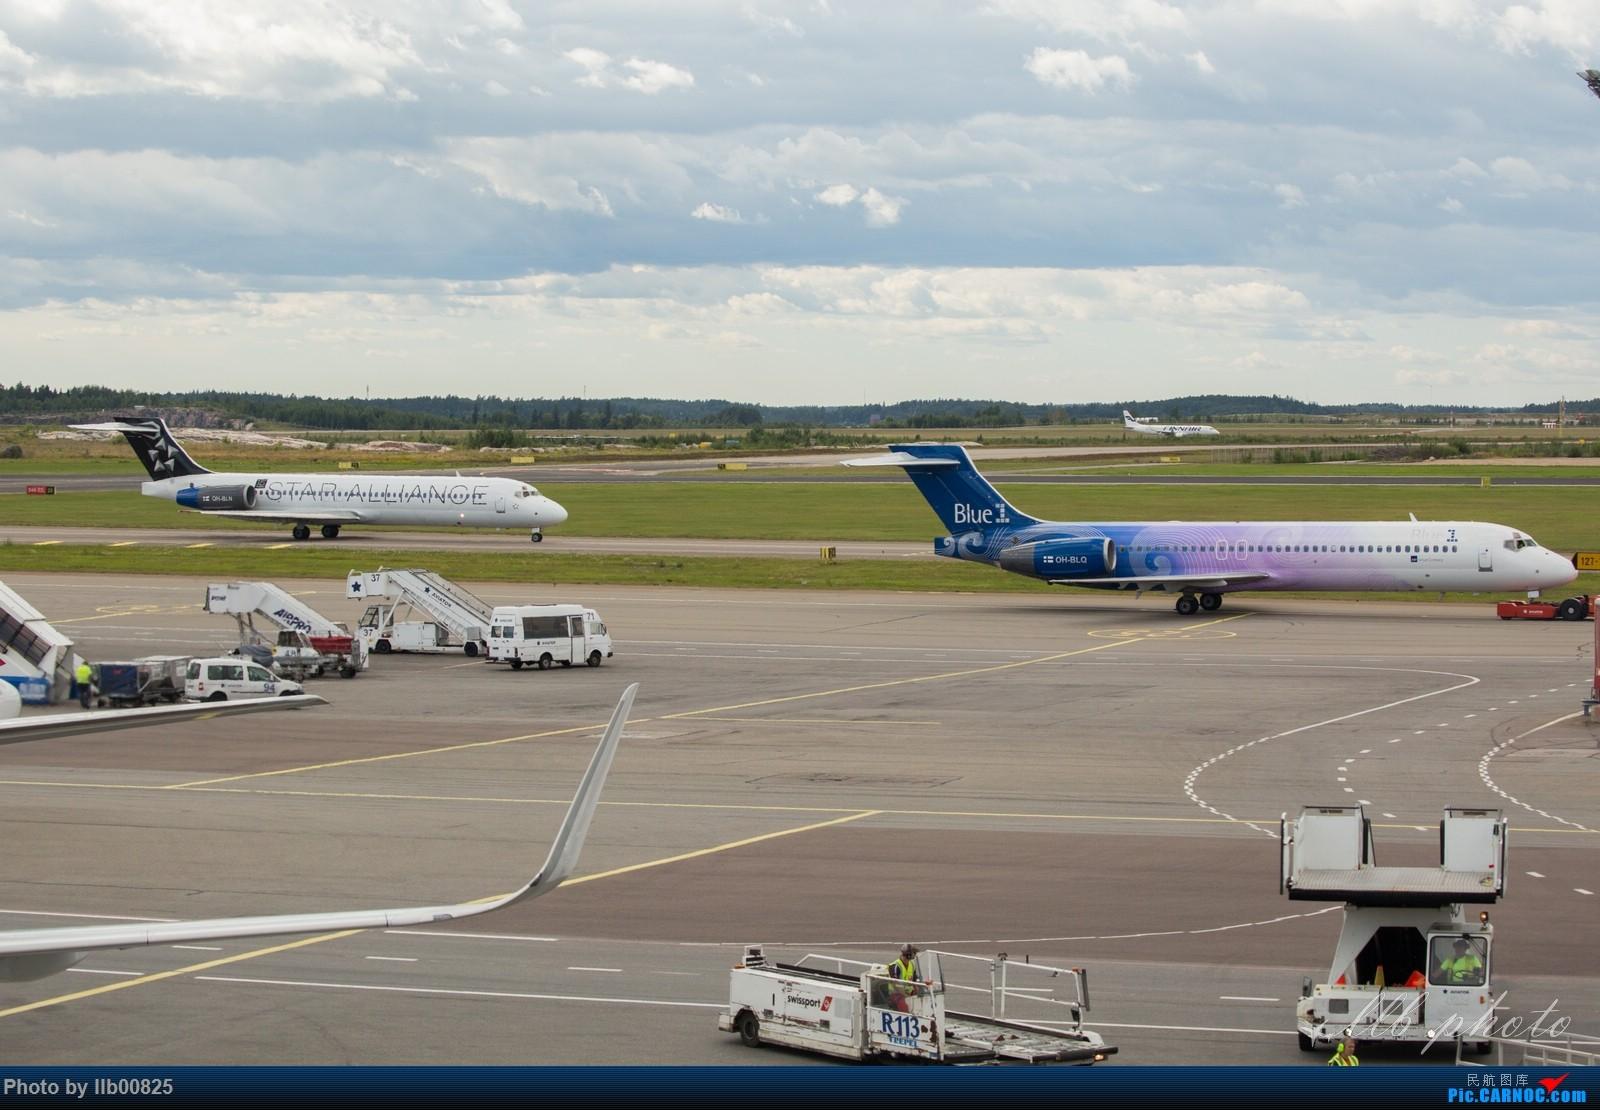 Re:[原创]赫尔辛基-布鲁塞尔一些杂图 BOEING 717 OH-BLQ 芬兰赫尔辛基机场